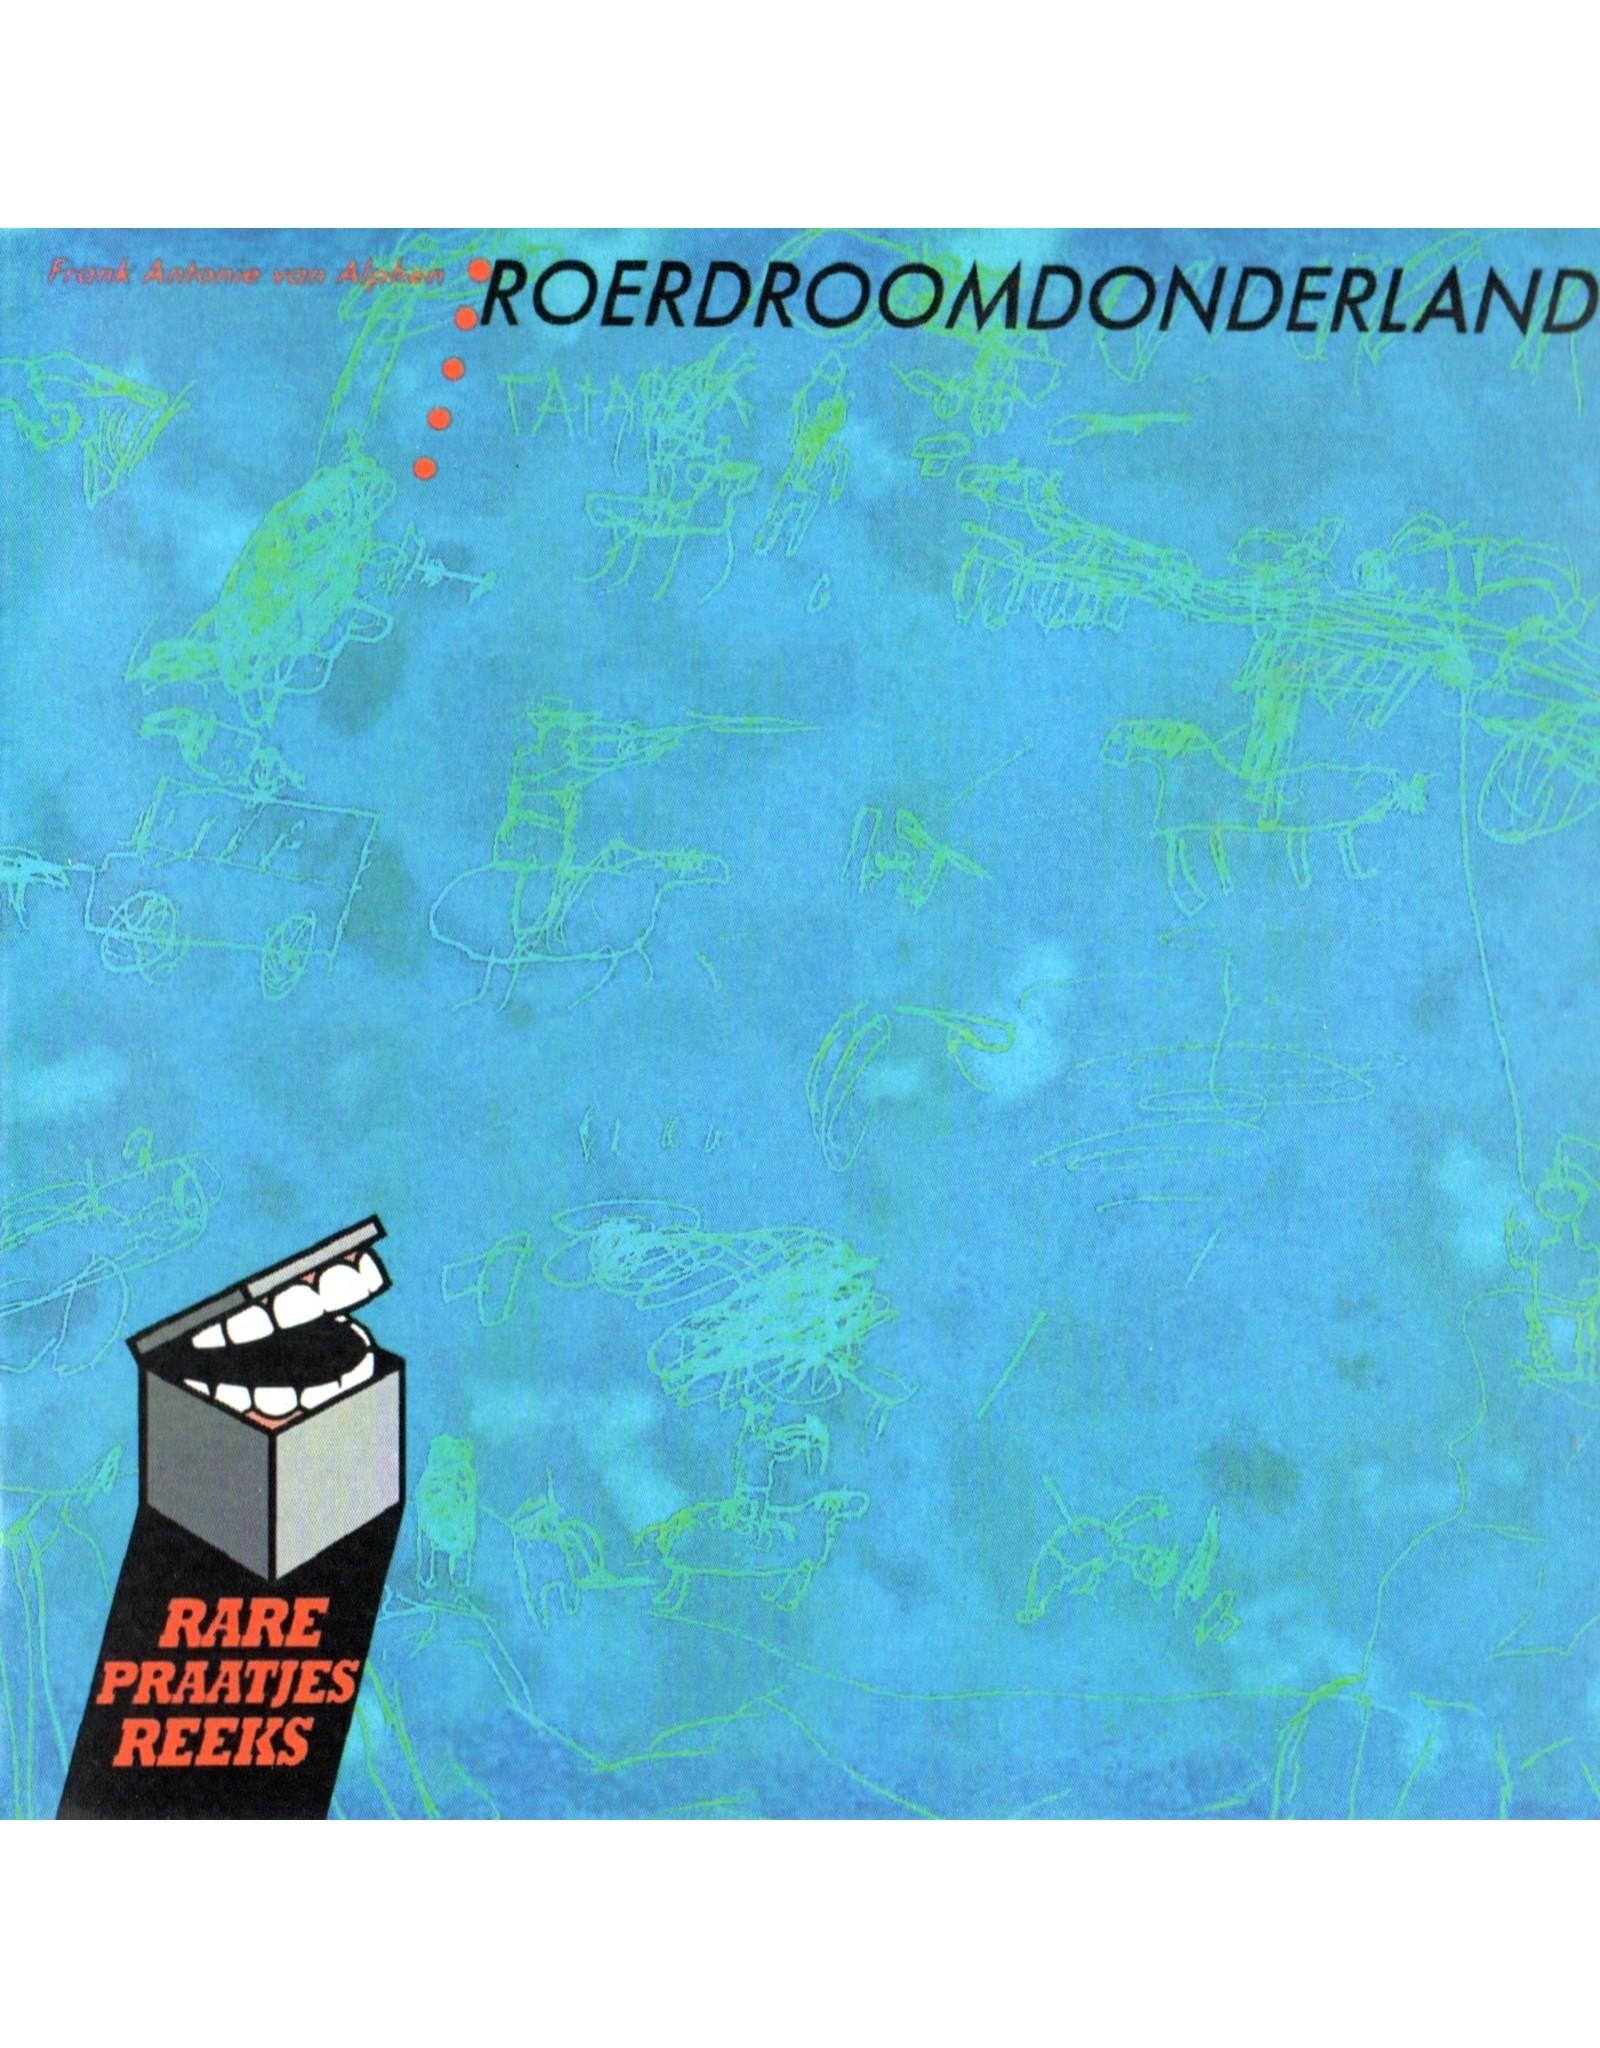 Roerdroomdonderland (Frank Antonie van Alphen)